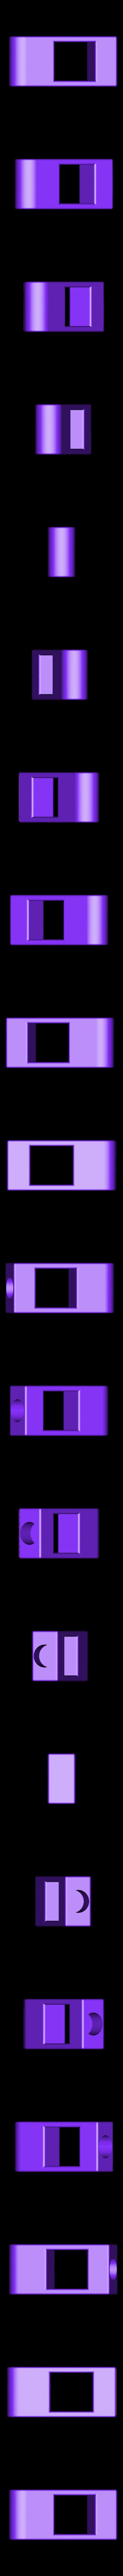 catch.stl Download free STL file Foam Dart GUN (pullback loading) • 3D print design, senns